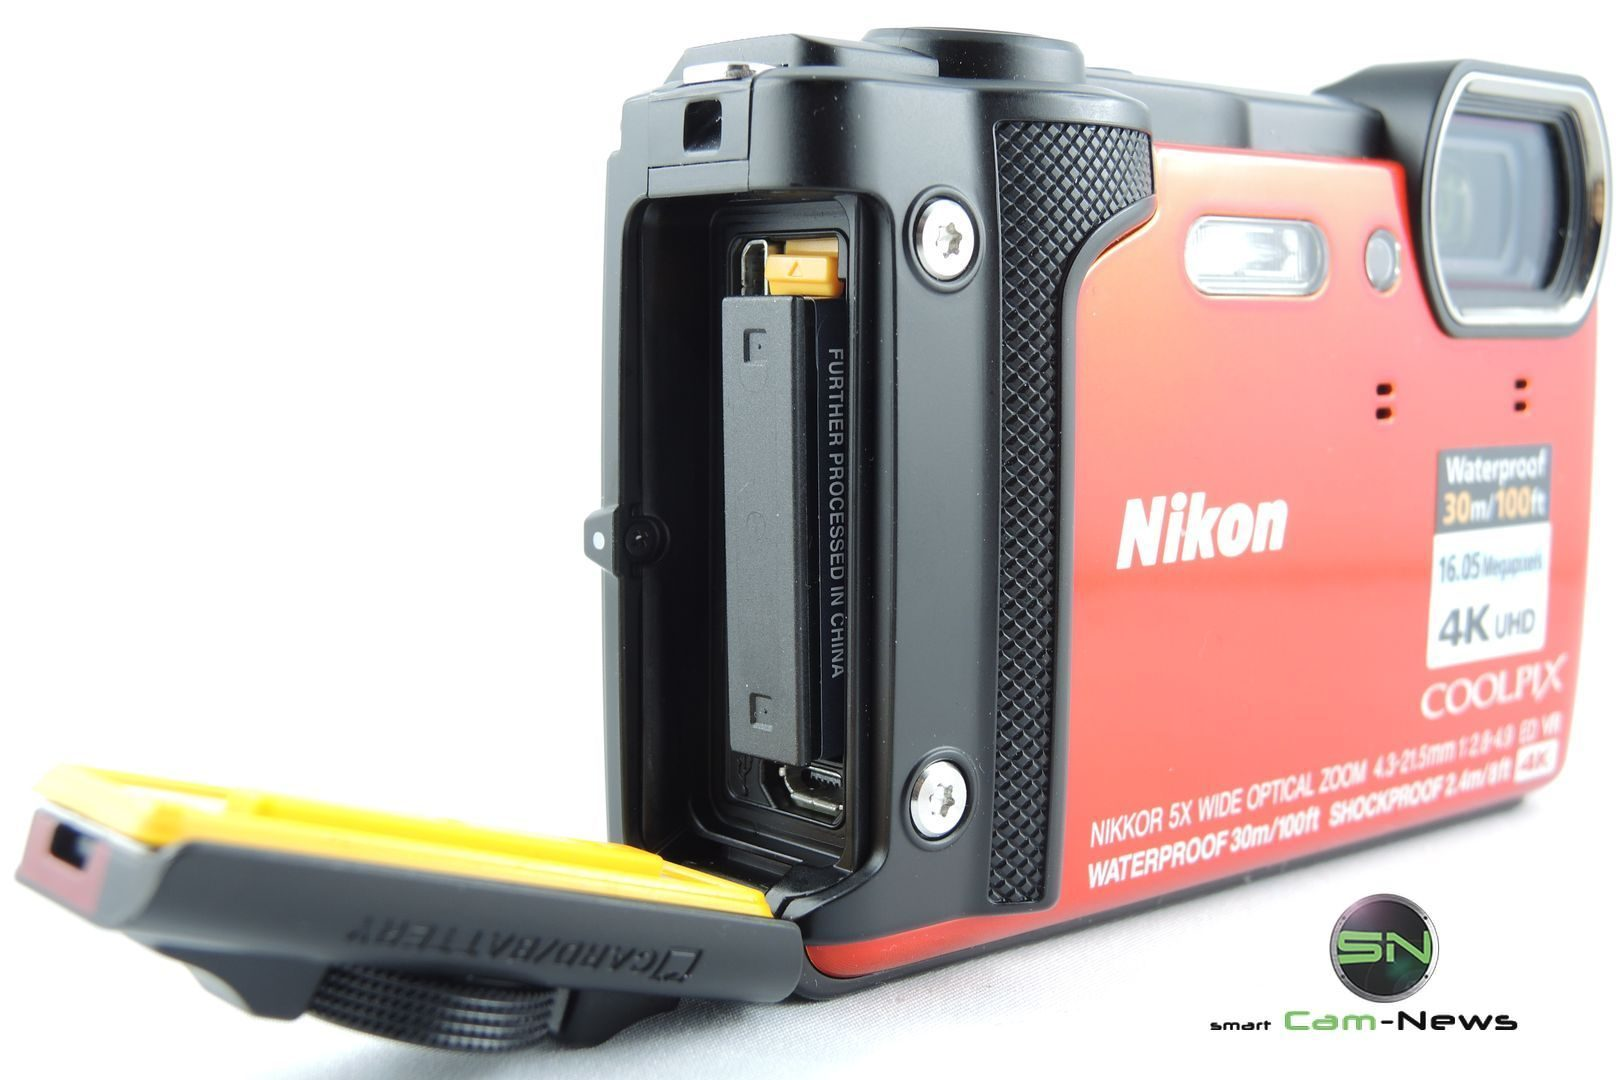 Dichtung SD Akku - Nikon W300 Outdoor Kamera - SmartCamNews